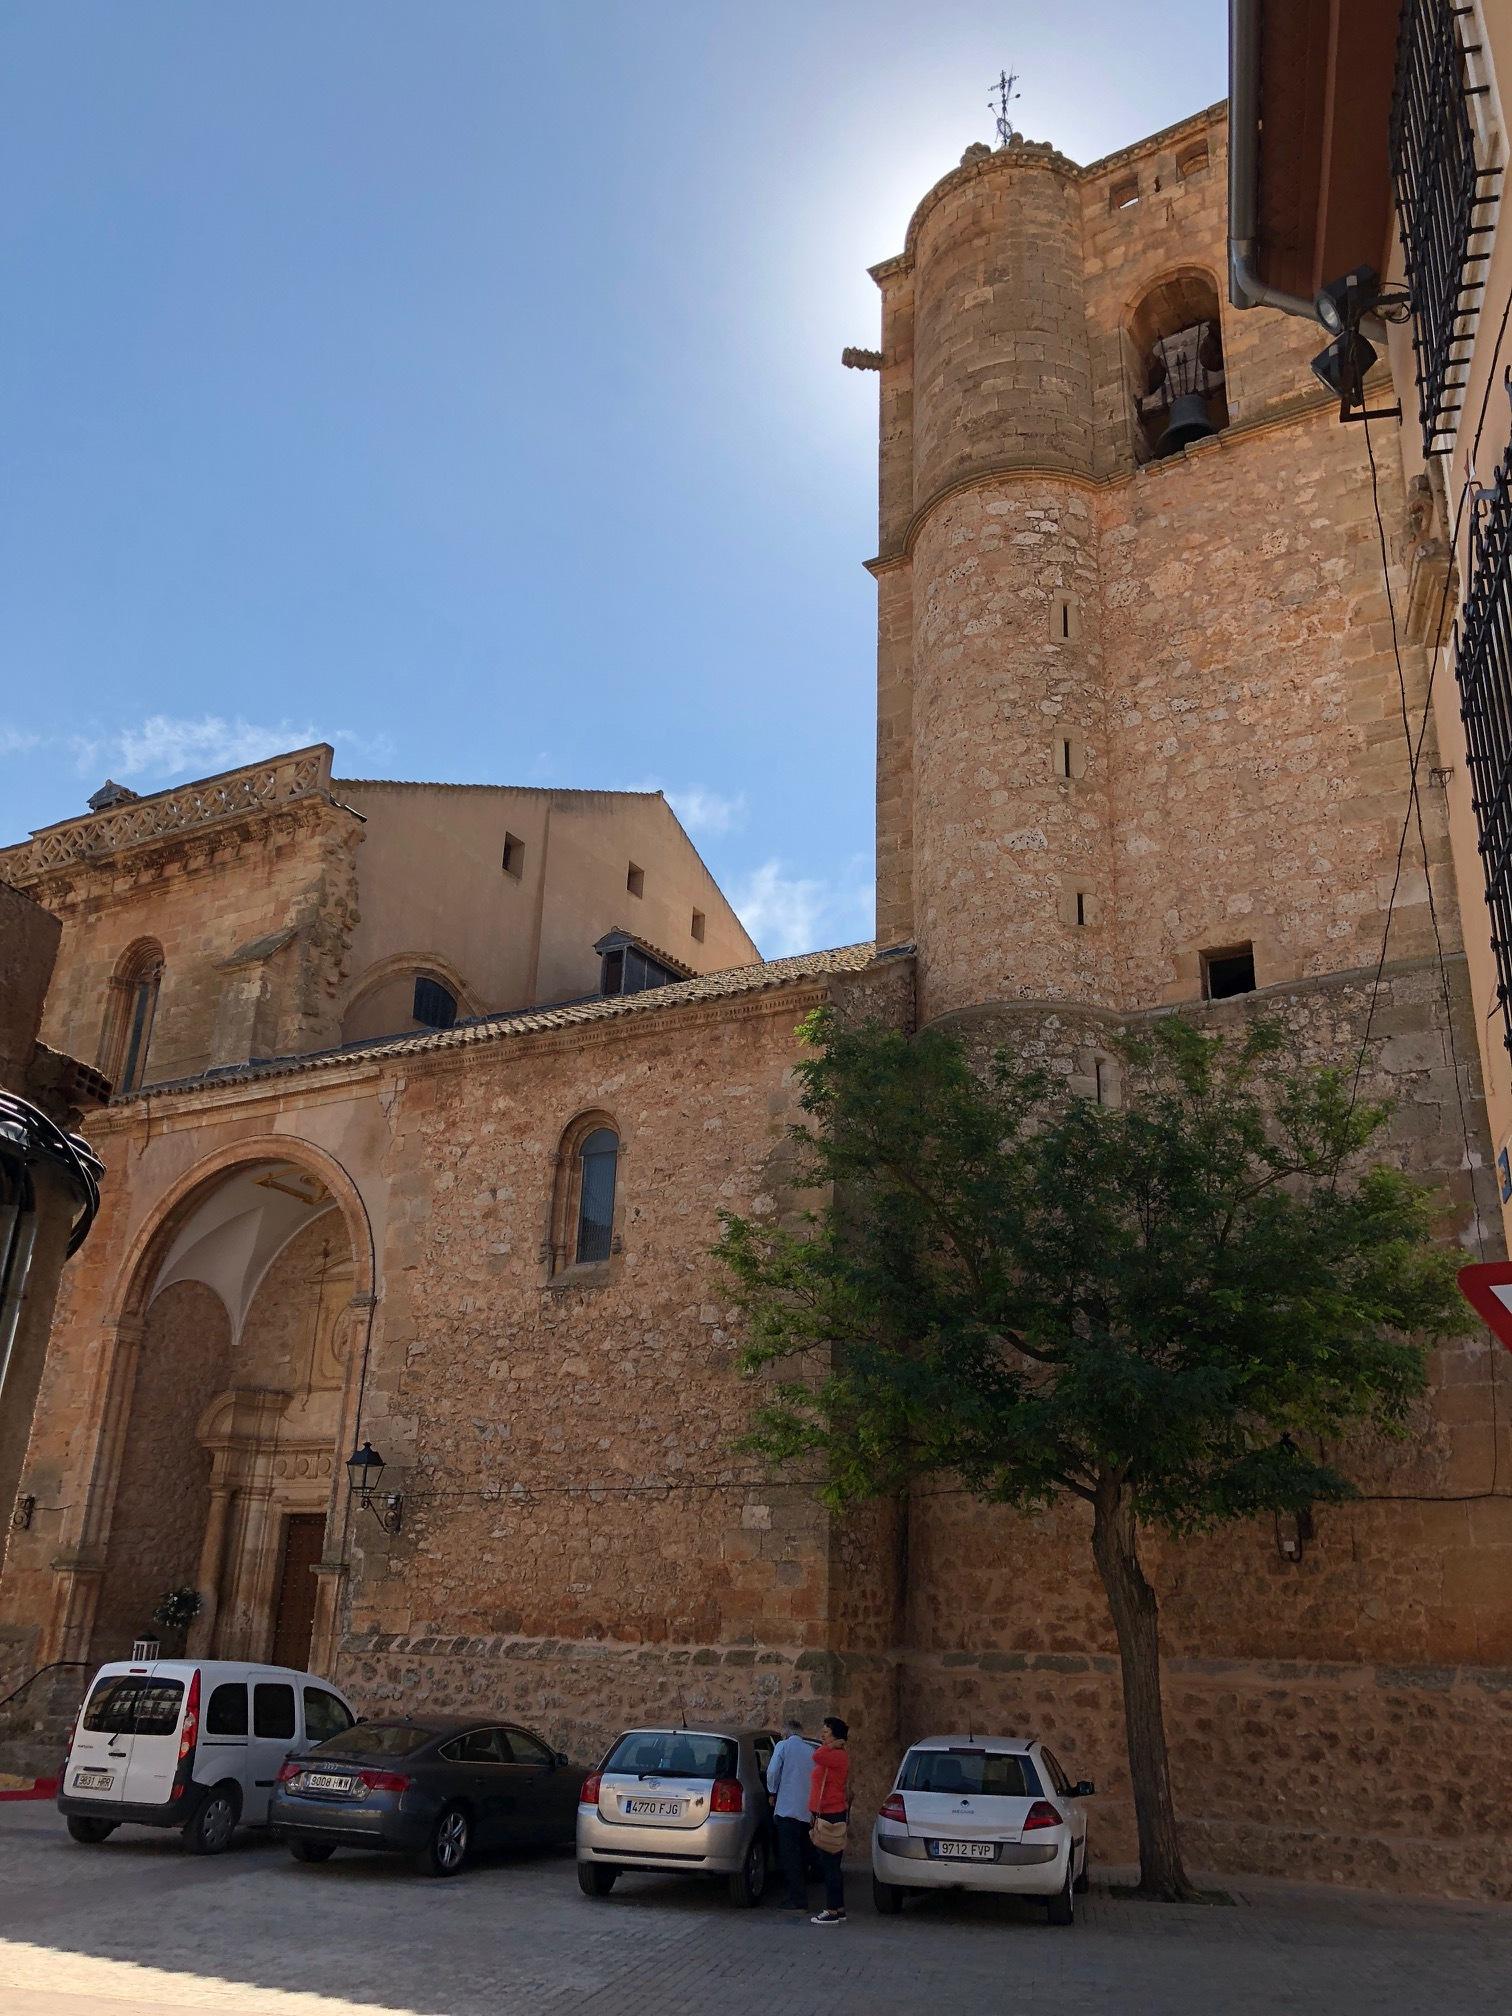 CHURCH DEDICATED TO SANTOS